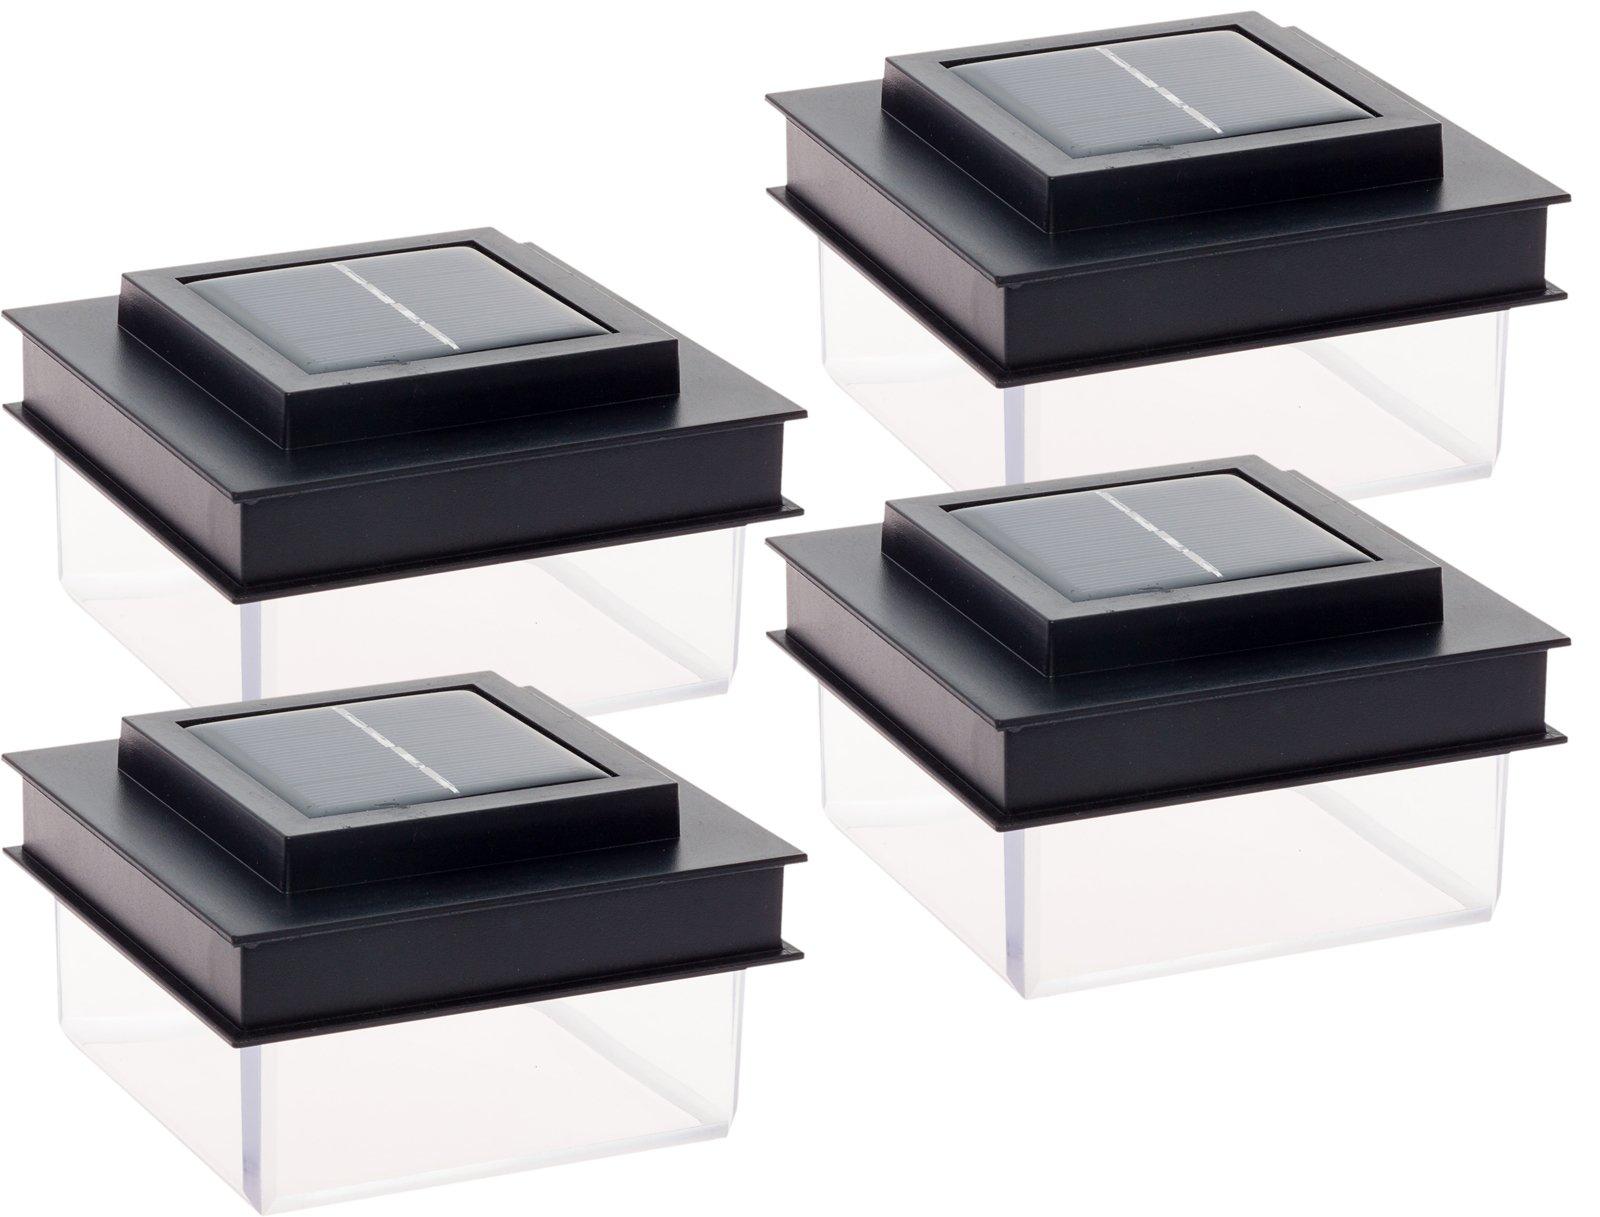 GreenLighting Translucent 12 Lumen LED Solar Powered Post Cap Light for 4x4 Wood Posts (4 Pack, Black) by GreenLighting